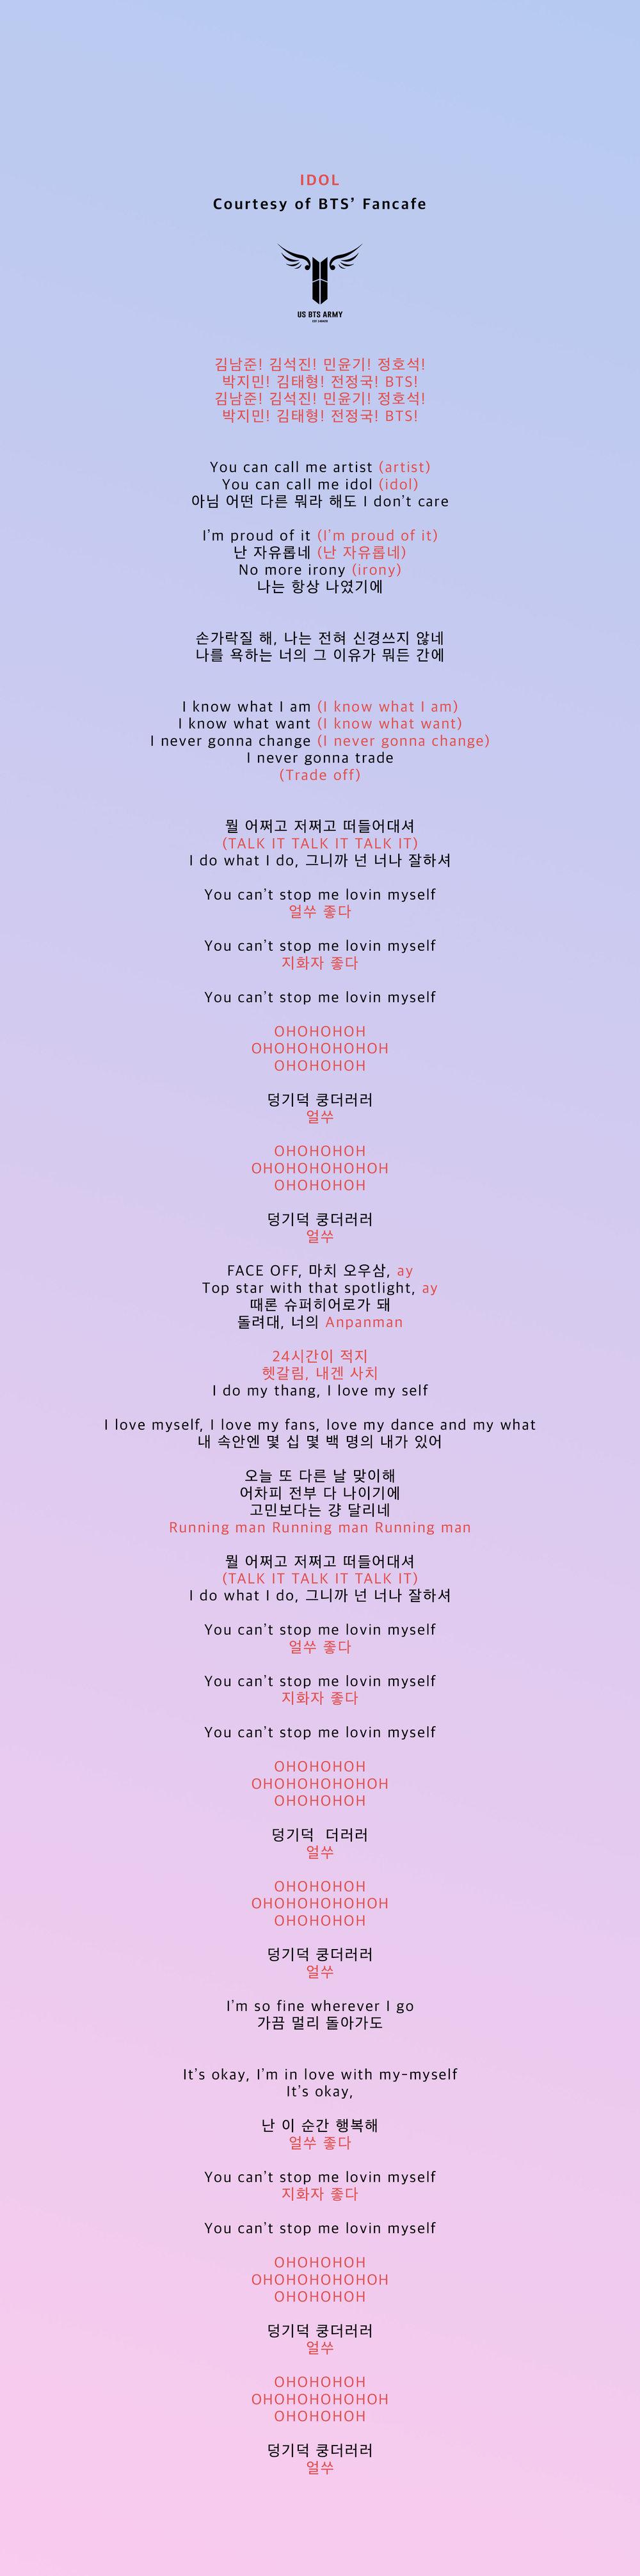 Official 'IDOL' Fanchant — US BTS ARMY